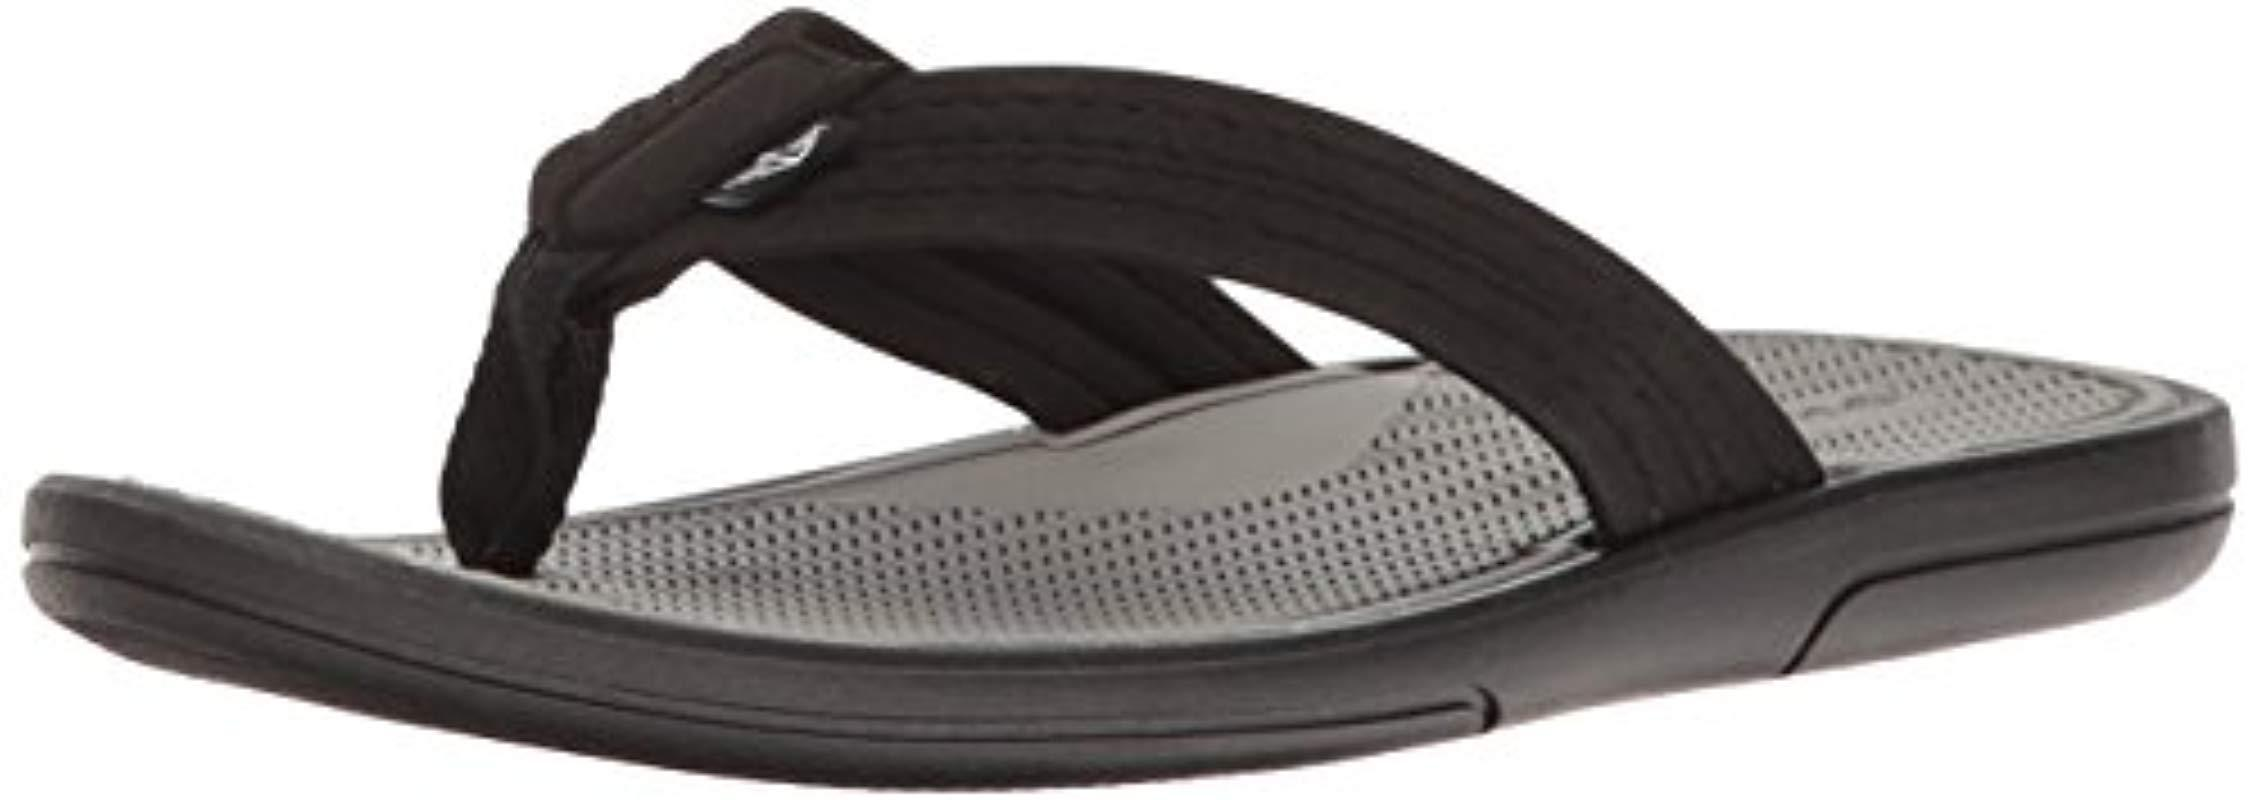 46f7bbadbe61 Lyst - Dockers Thomas Beach Walk Sandal Flip Flop in Black for Men ...